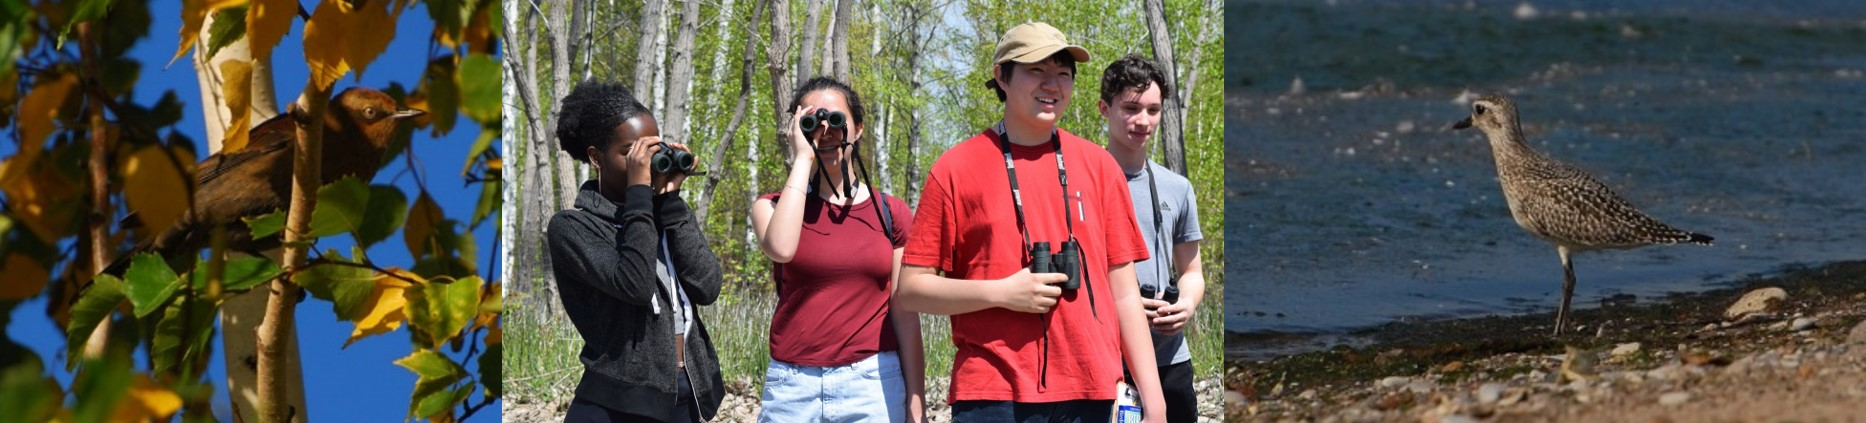 Three photos - Rusty Blackbird; youth with binoculars; Shorebird